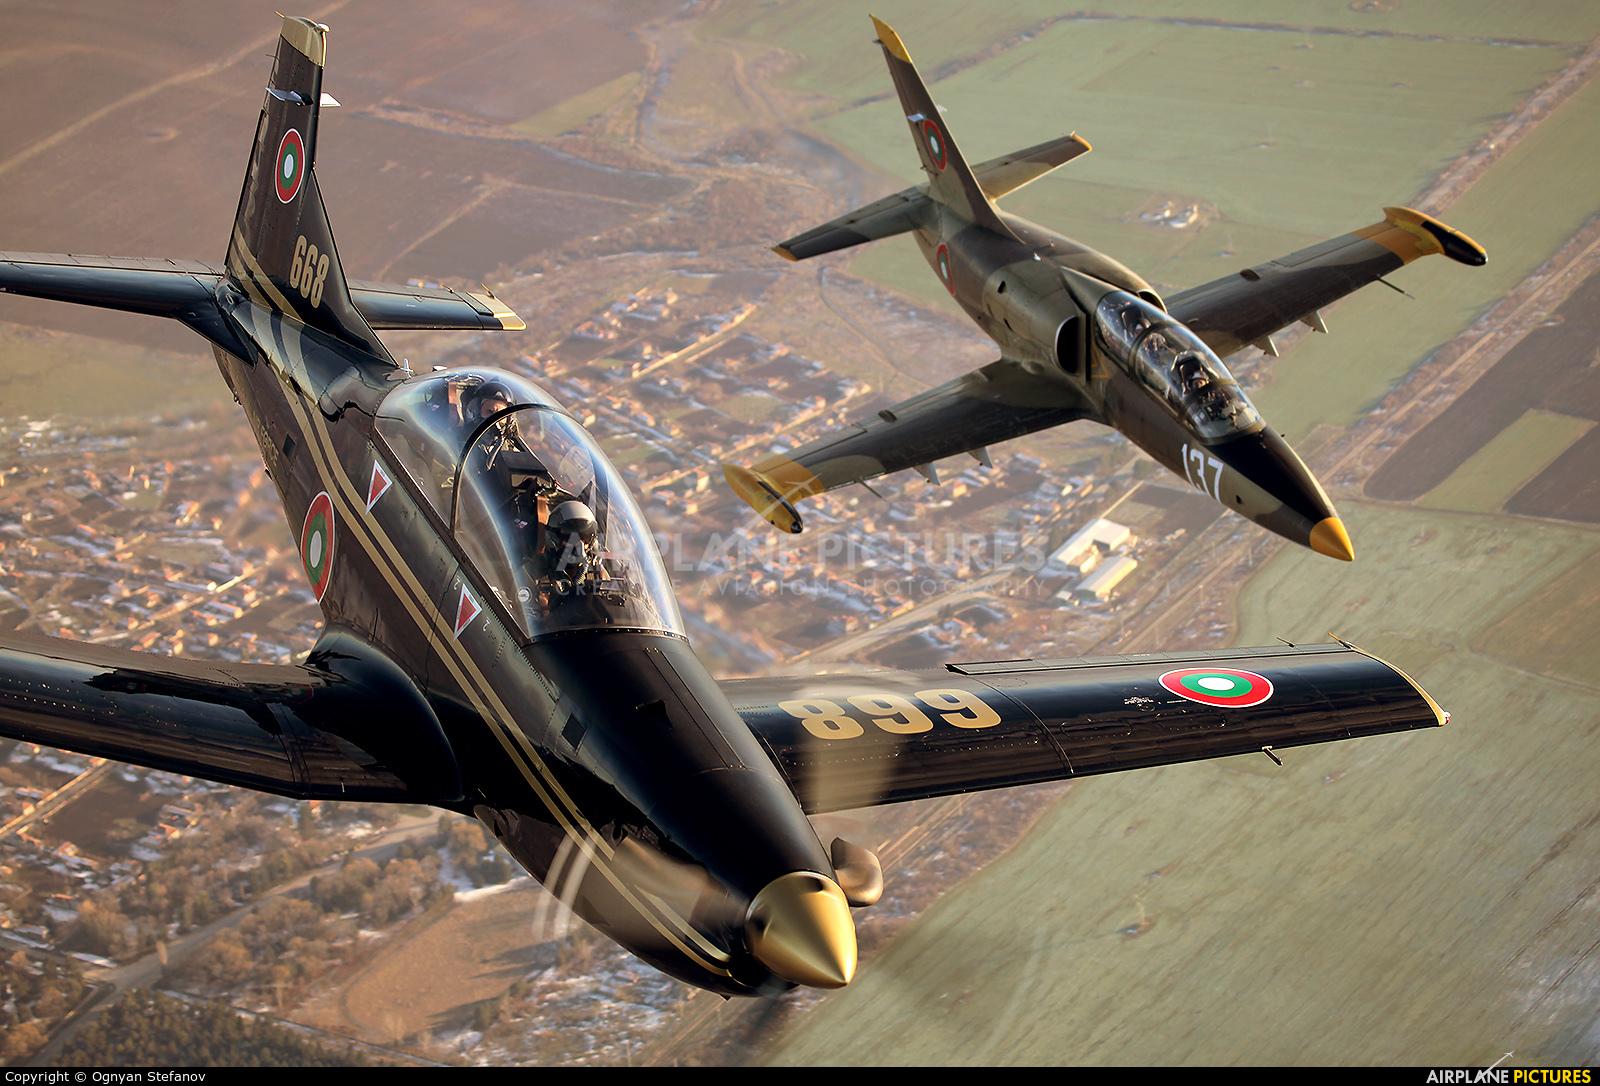 Bulgaria - Air Force 668 aircraft at In Flight - Bulgaria